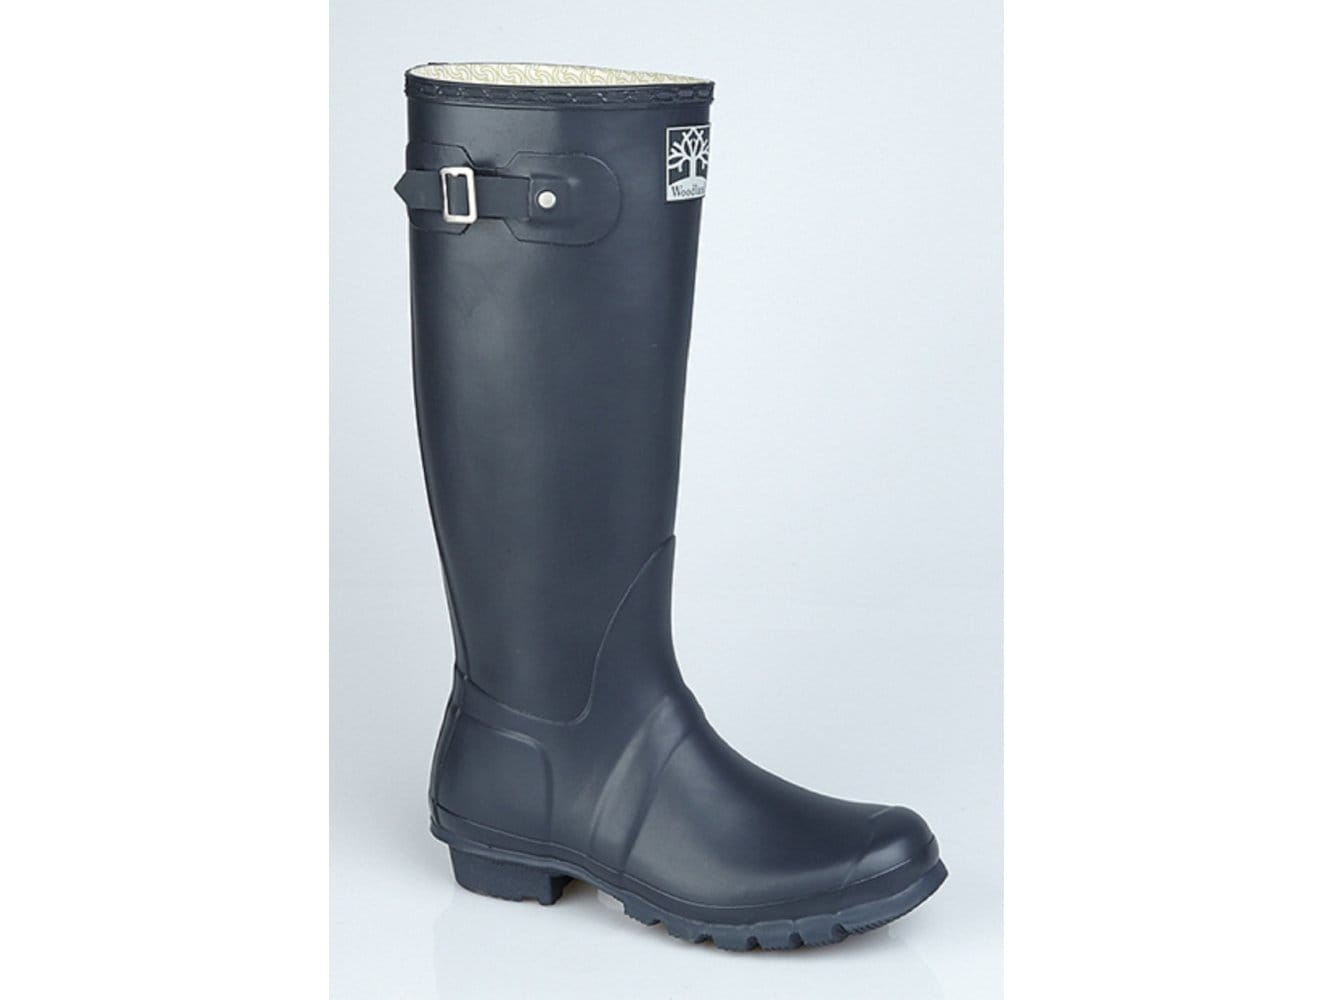 Woodland ORIGINAL  Rain Uomo Damenschuhe Waterproof Winter Rain  Wellies Wellington Stiefel 3c81bc